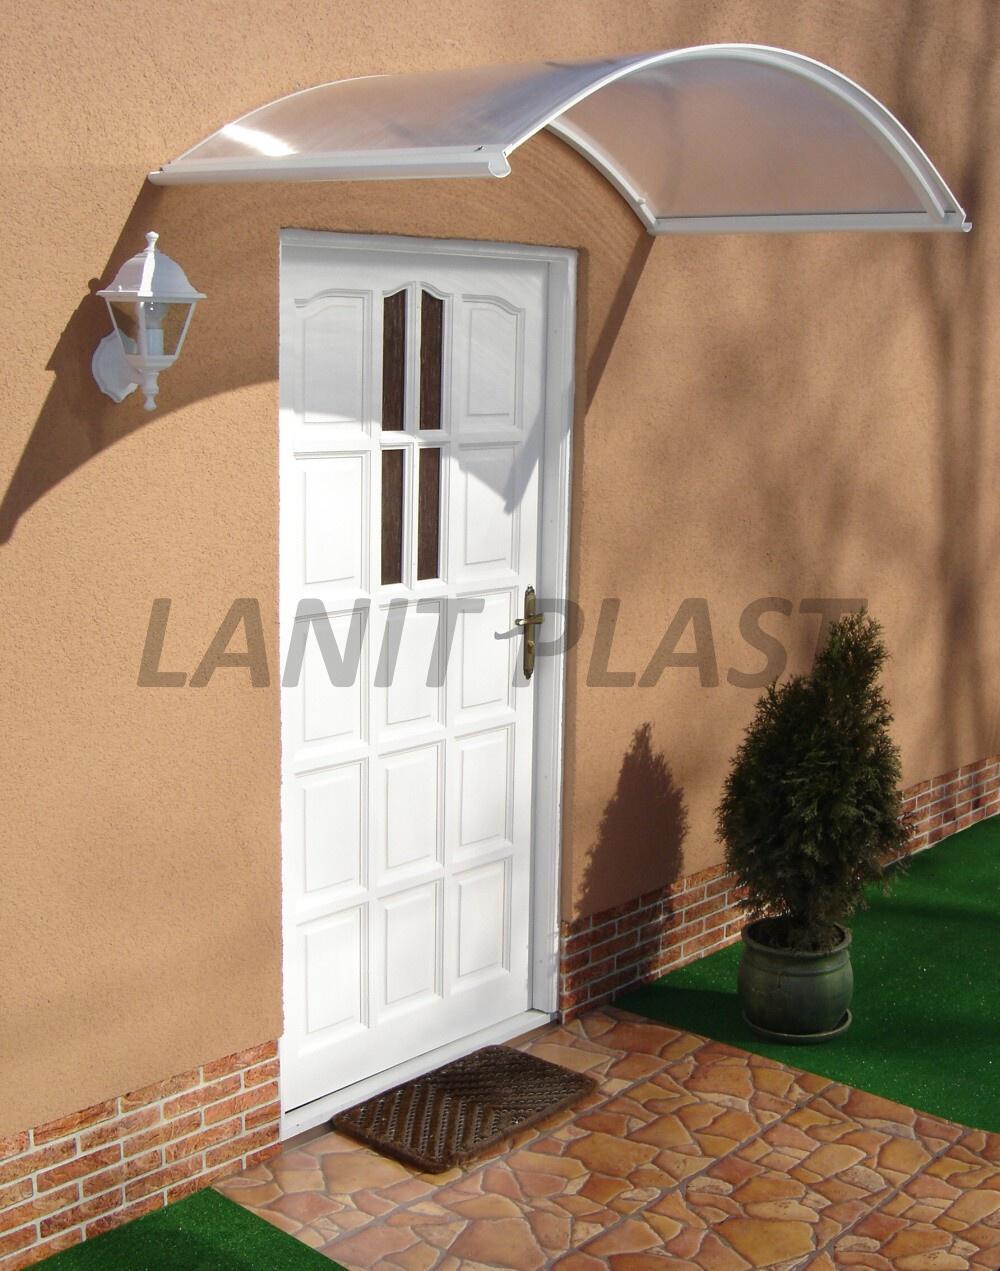 Vchodová stříška LANITPLAST ARCUS 160/90 bílá